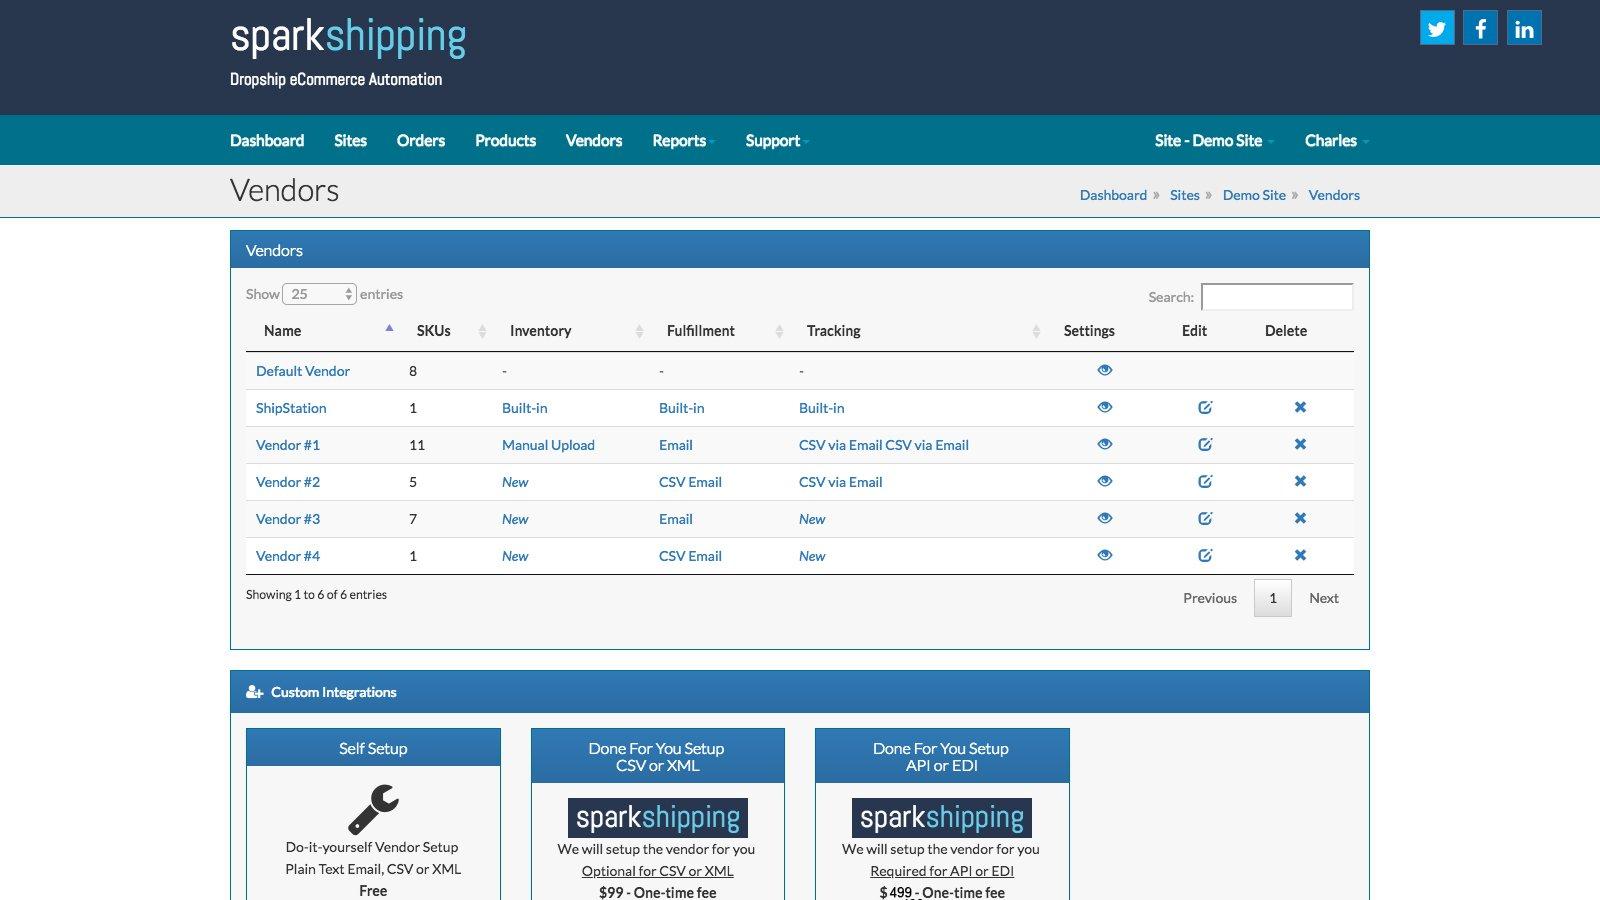 Spark Shipping